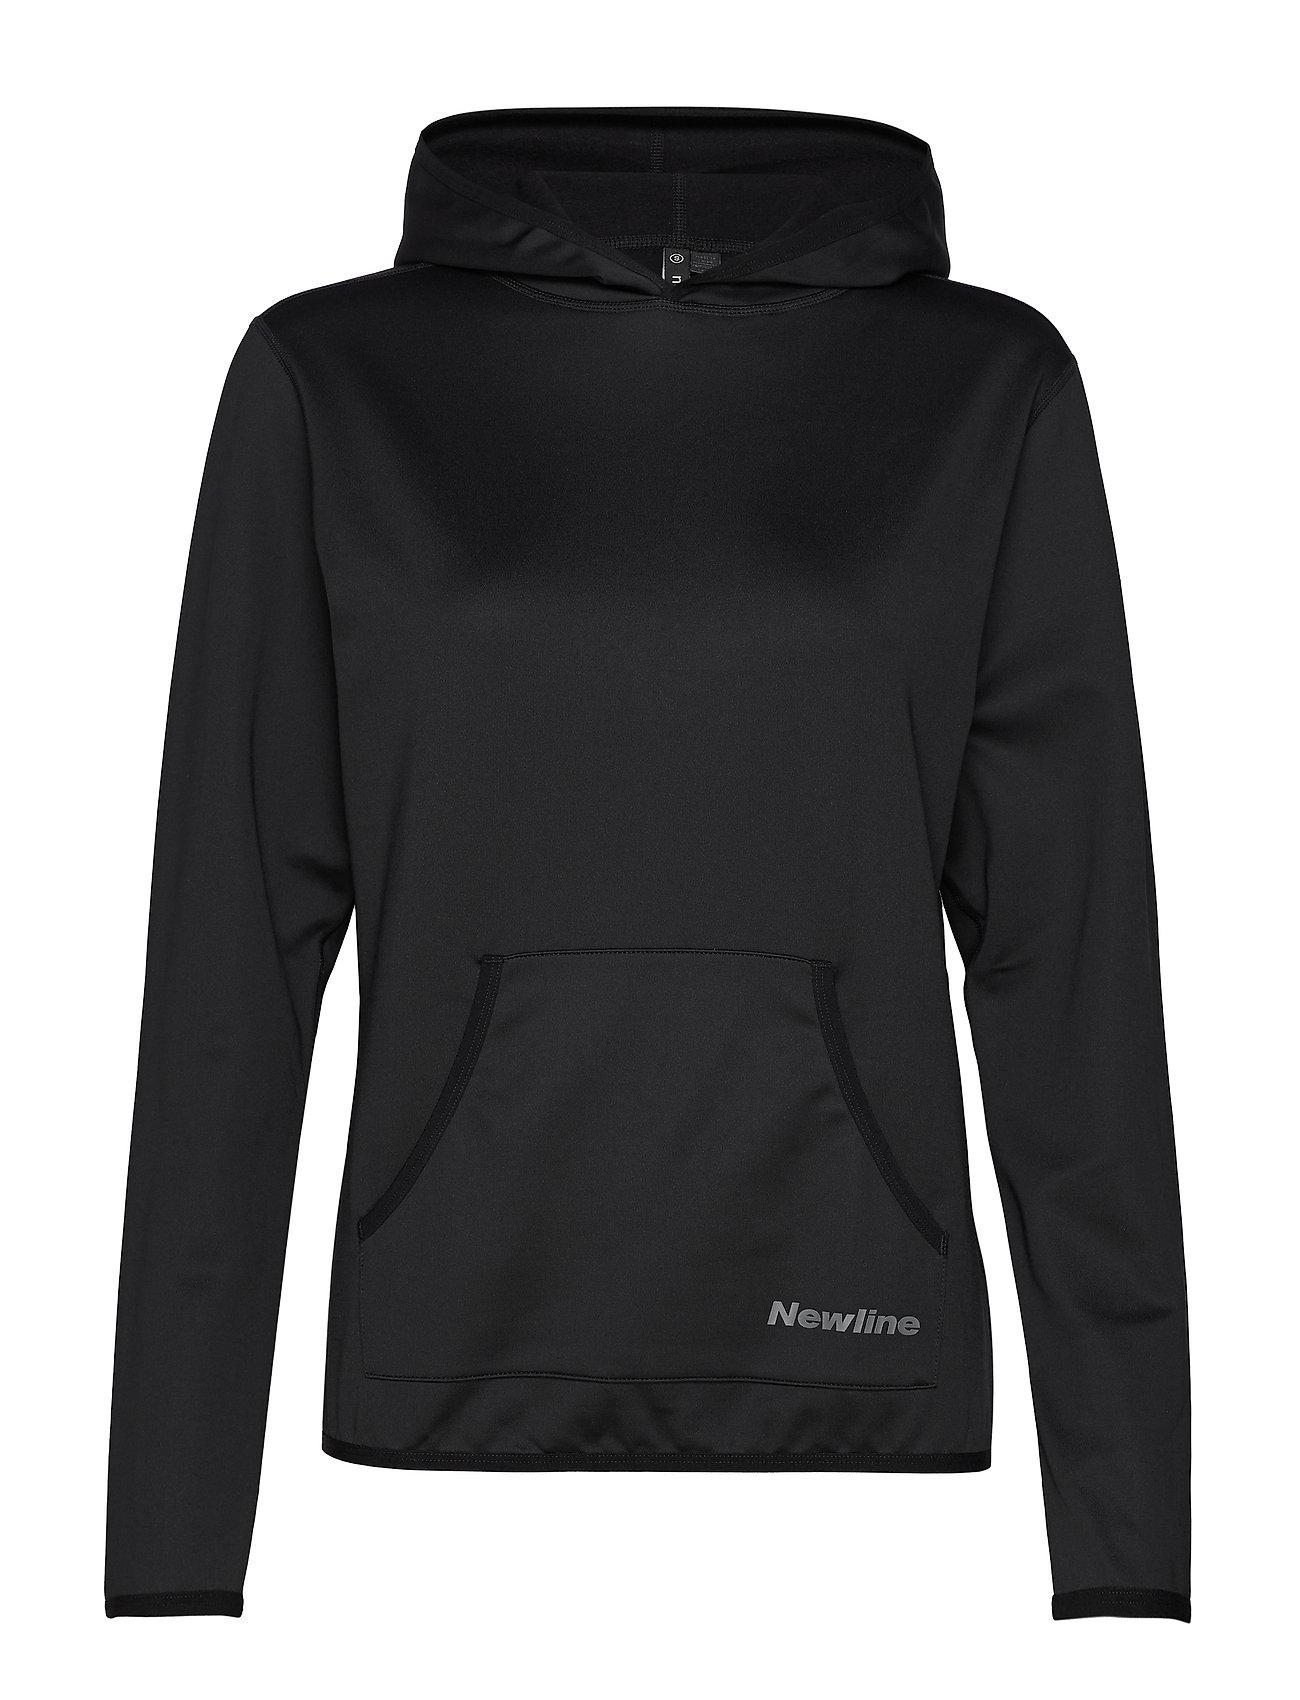 Newline Tech Hoodie - BLACK